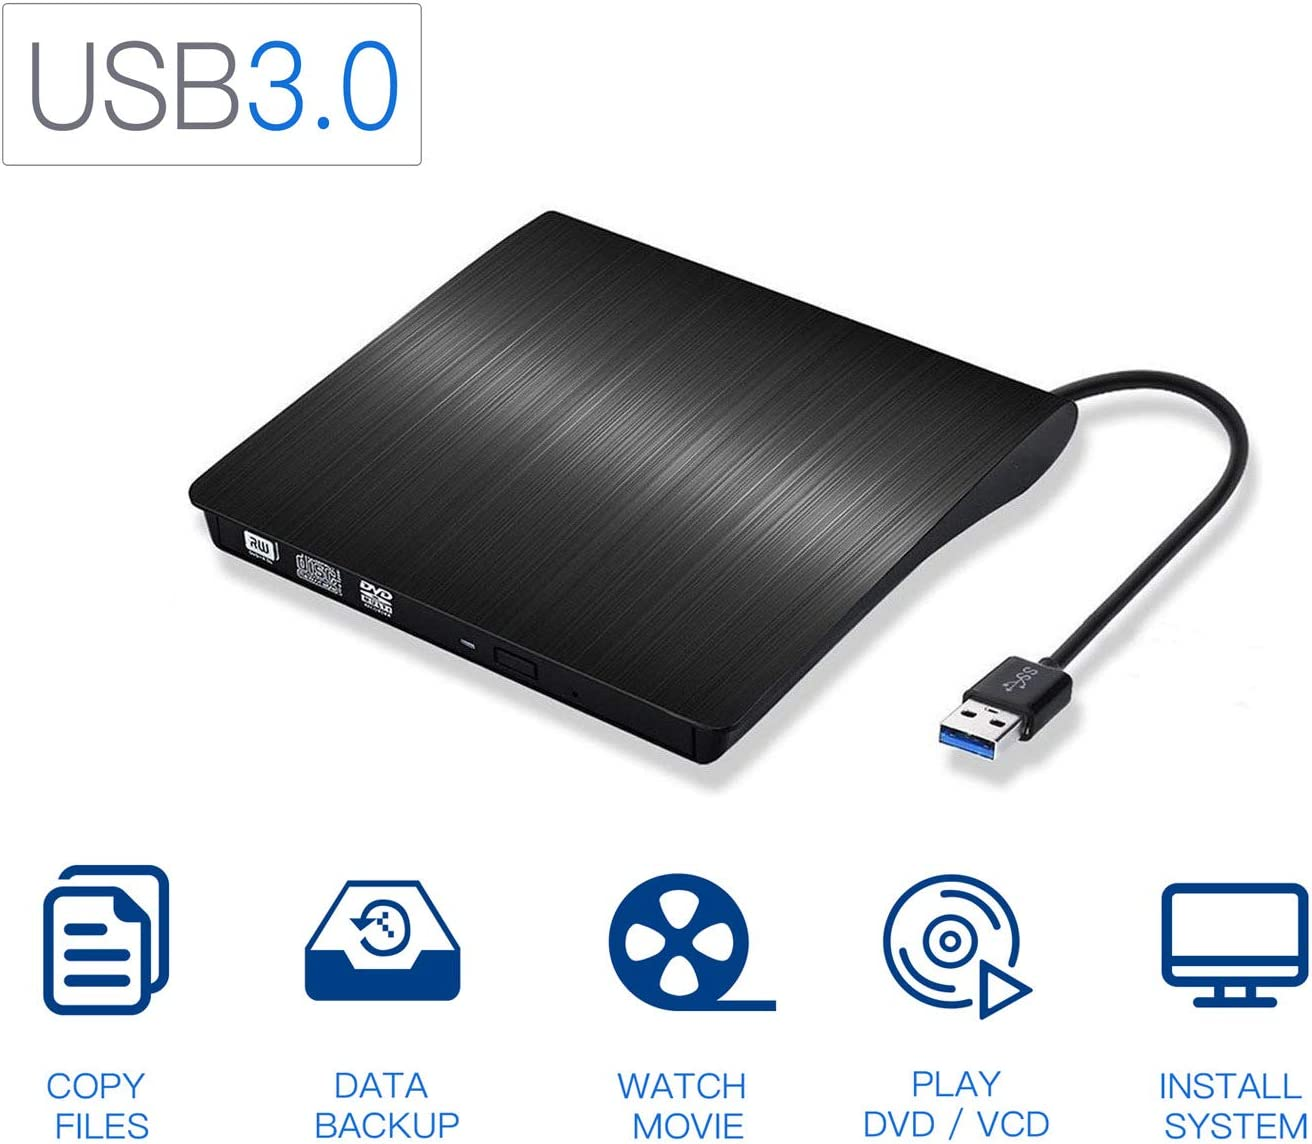 Xglysmyc USB 3.0 External CD/DVD Drive,Ultra-Thin Touch Portable High-Speed Data Transfer CD/DVD-RW Burner Player for Desktop Laptop Ultrabook Support Windows XP/7/8/10/Vista,Mac OS-Black